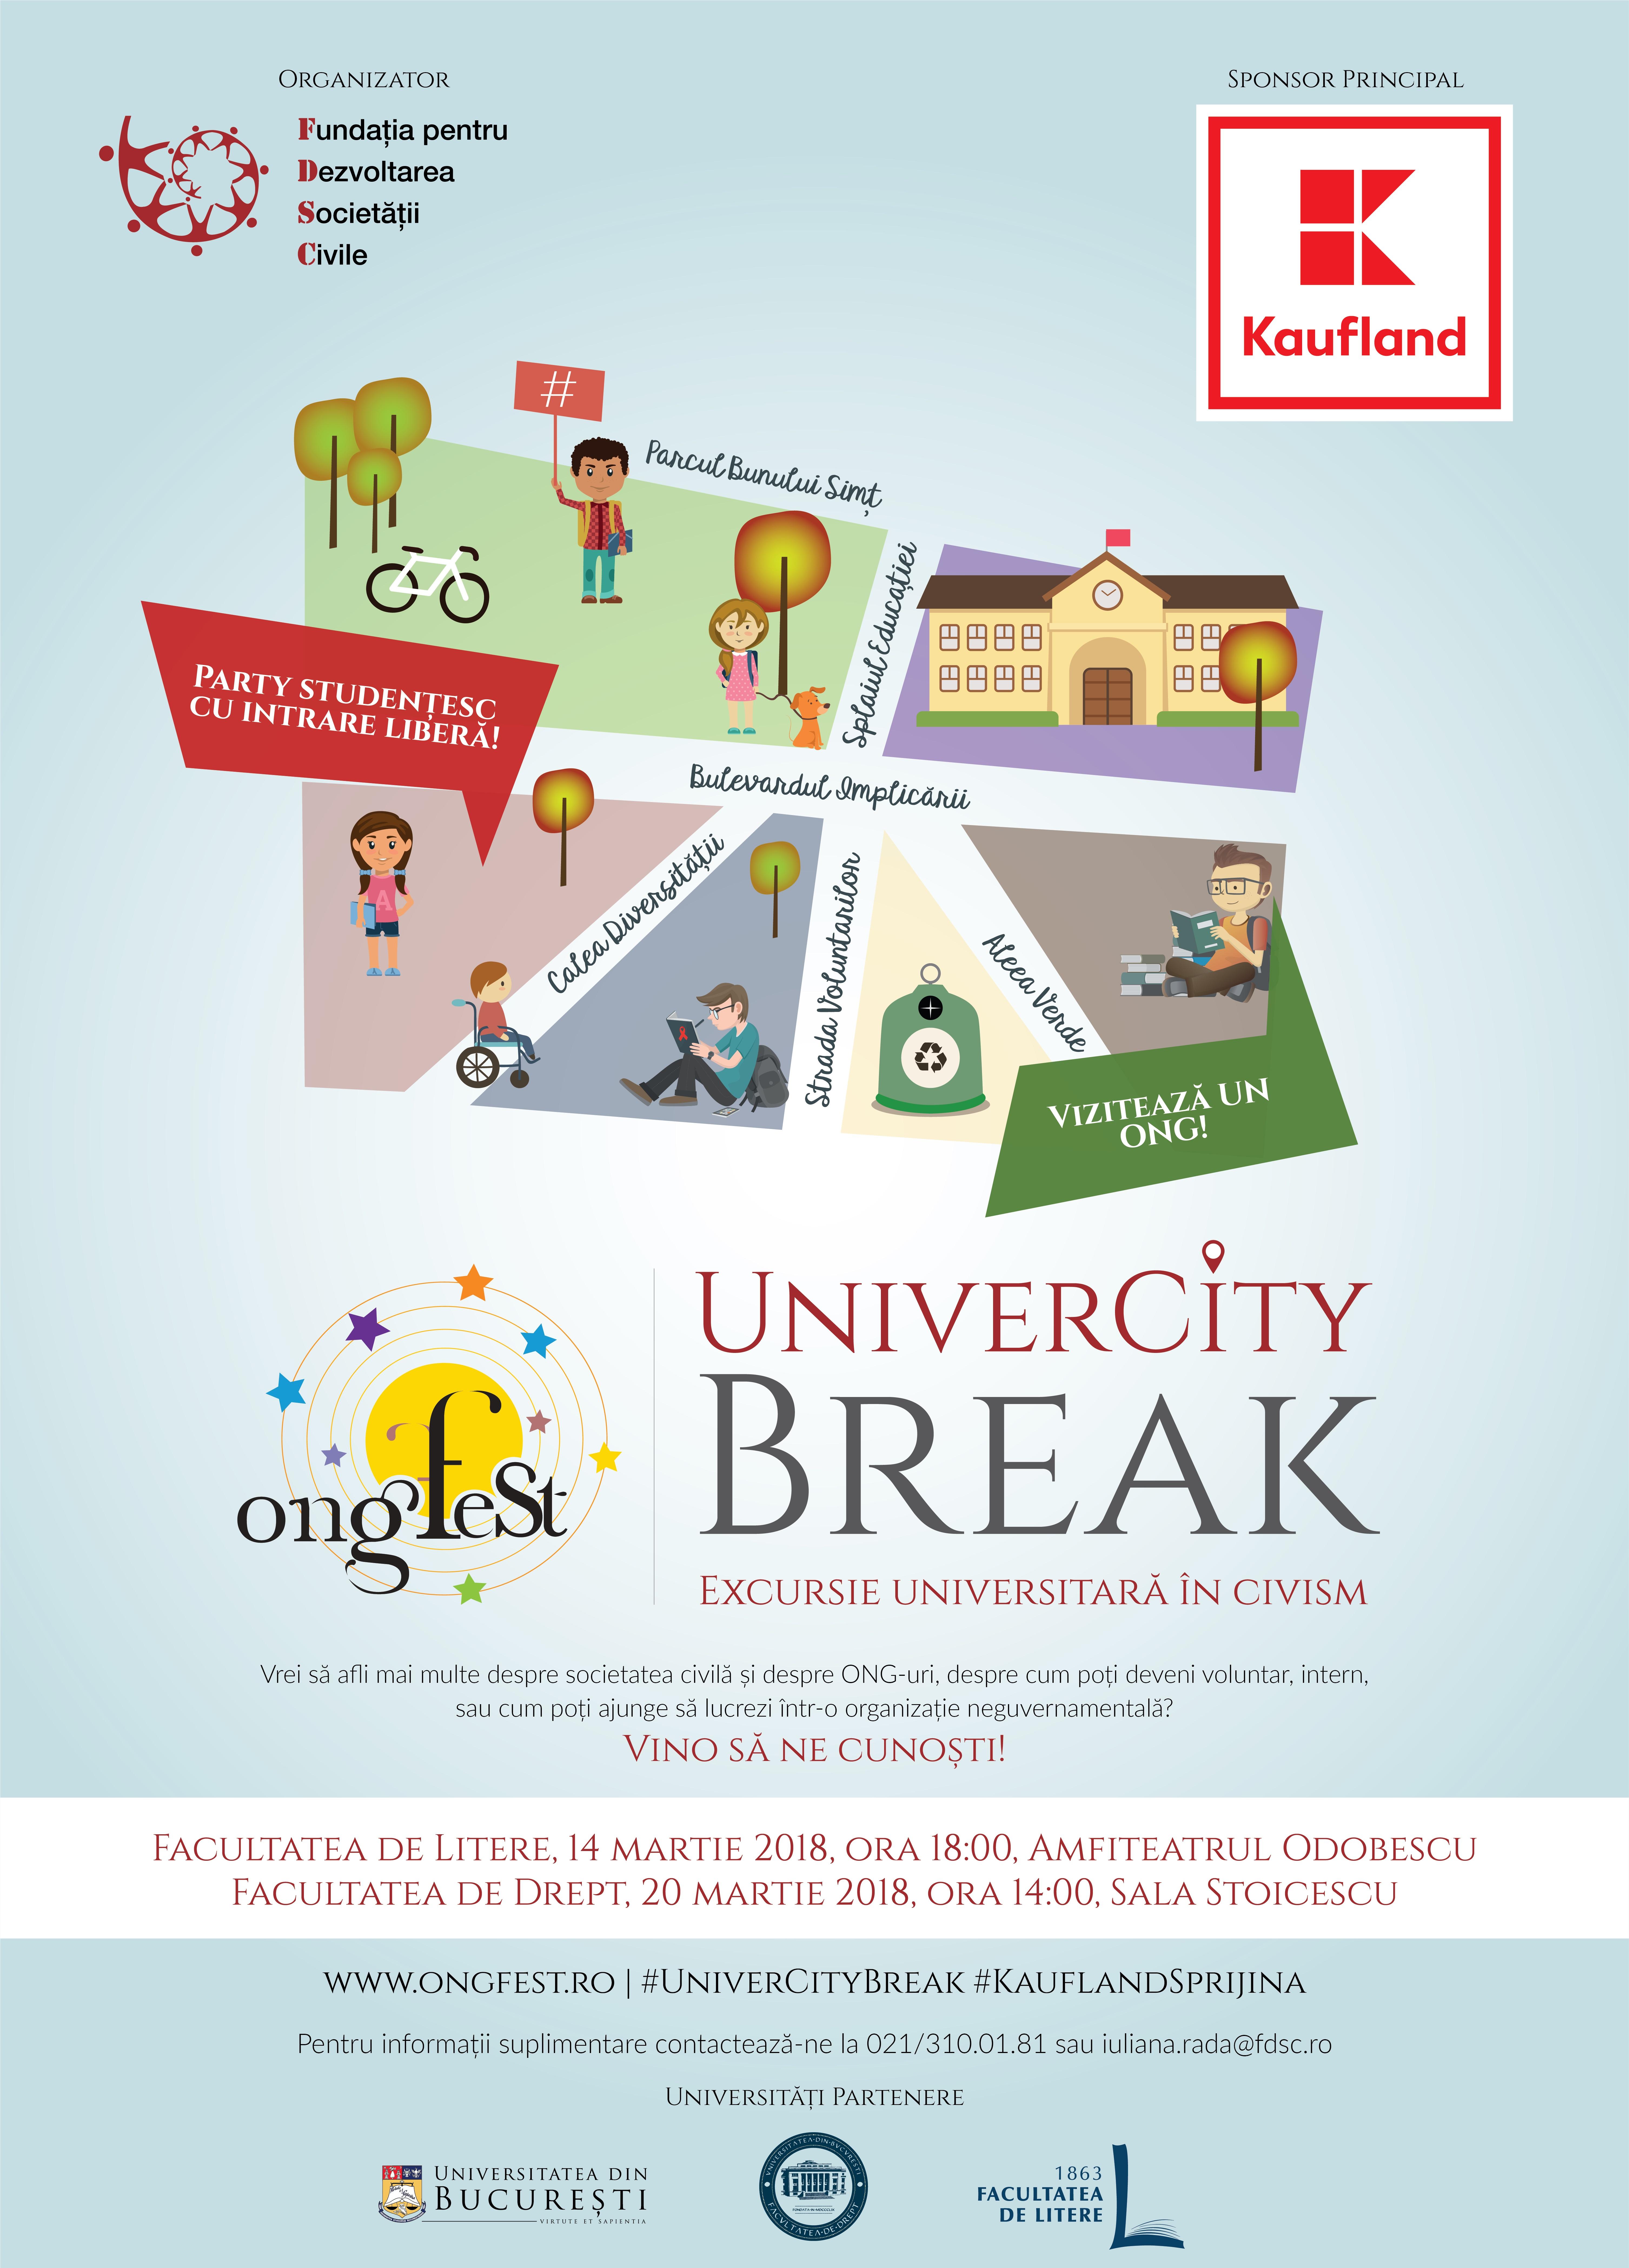 UniverCity Break - excursie universitară în civism